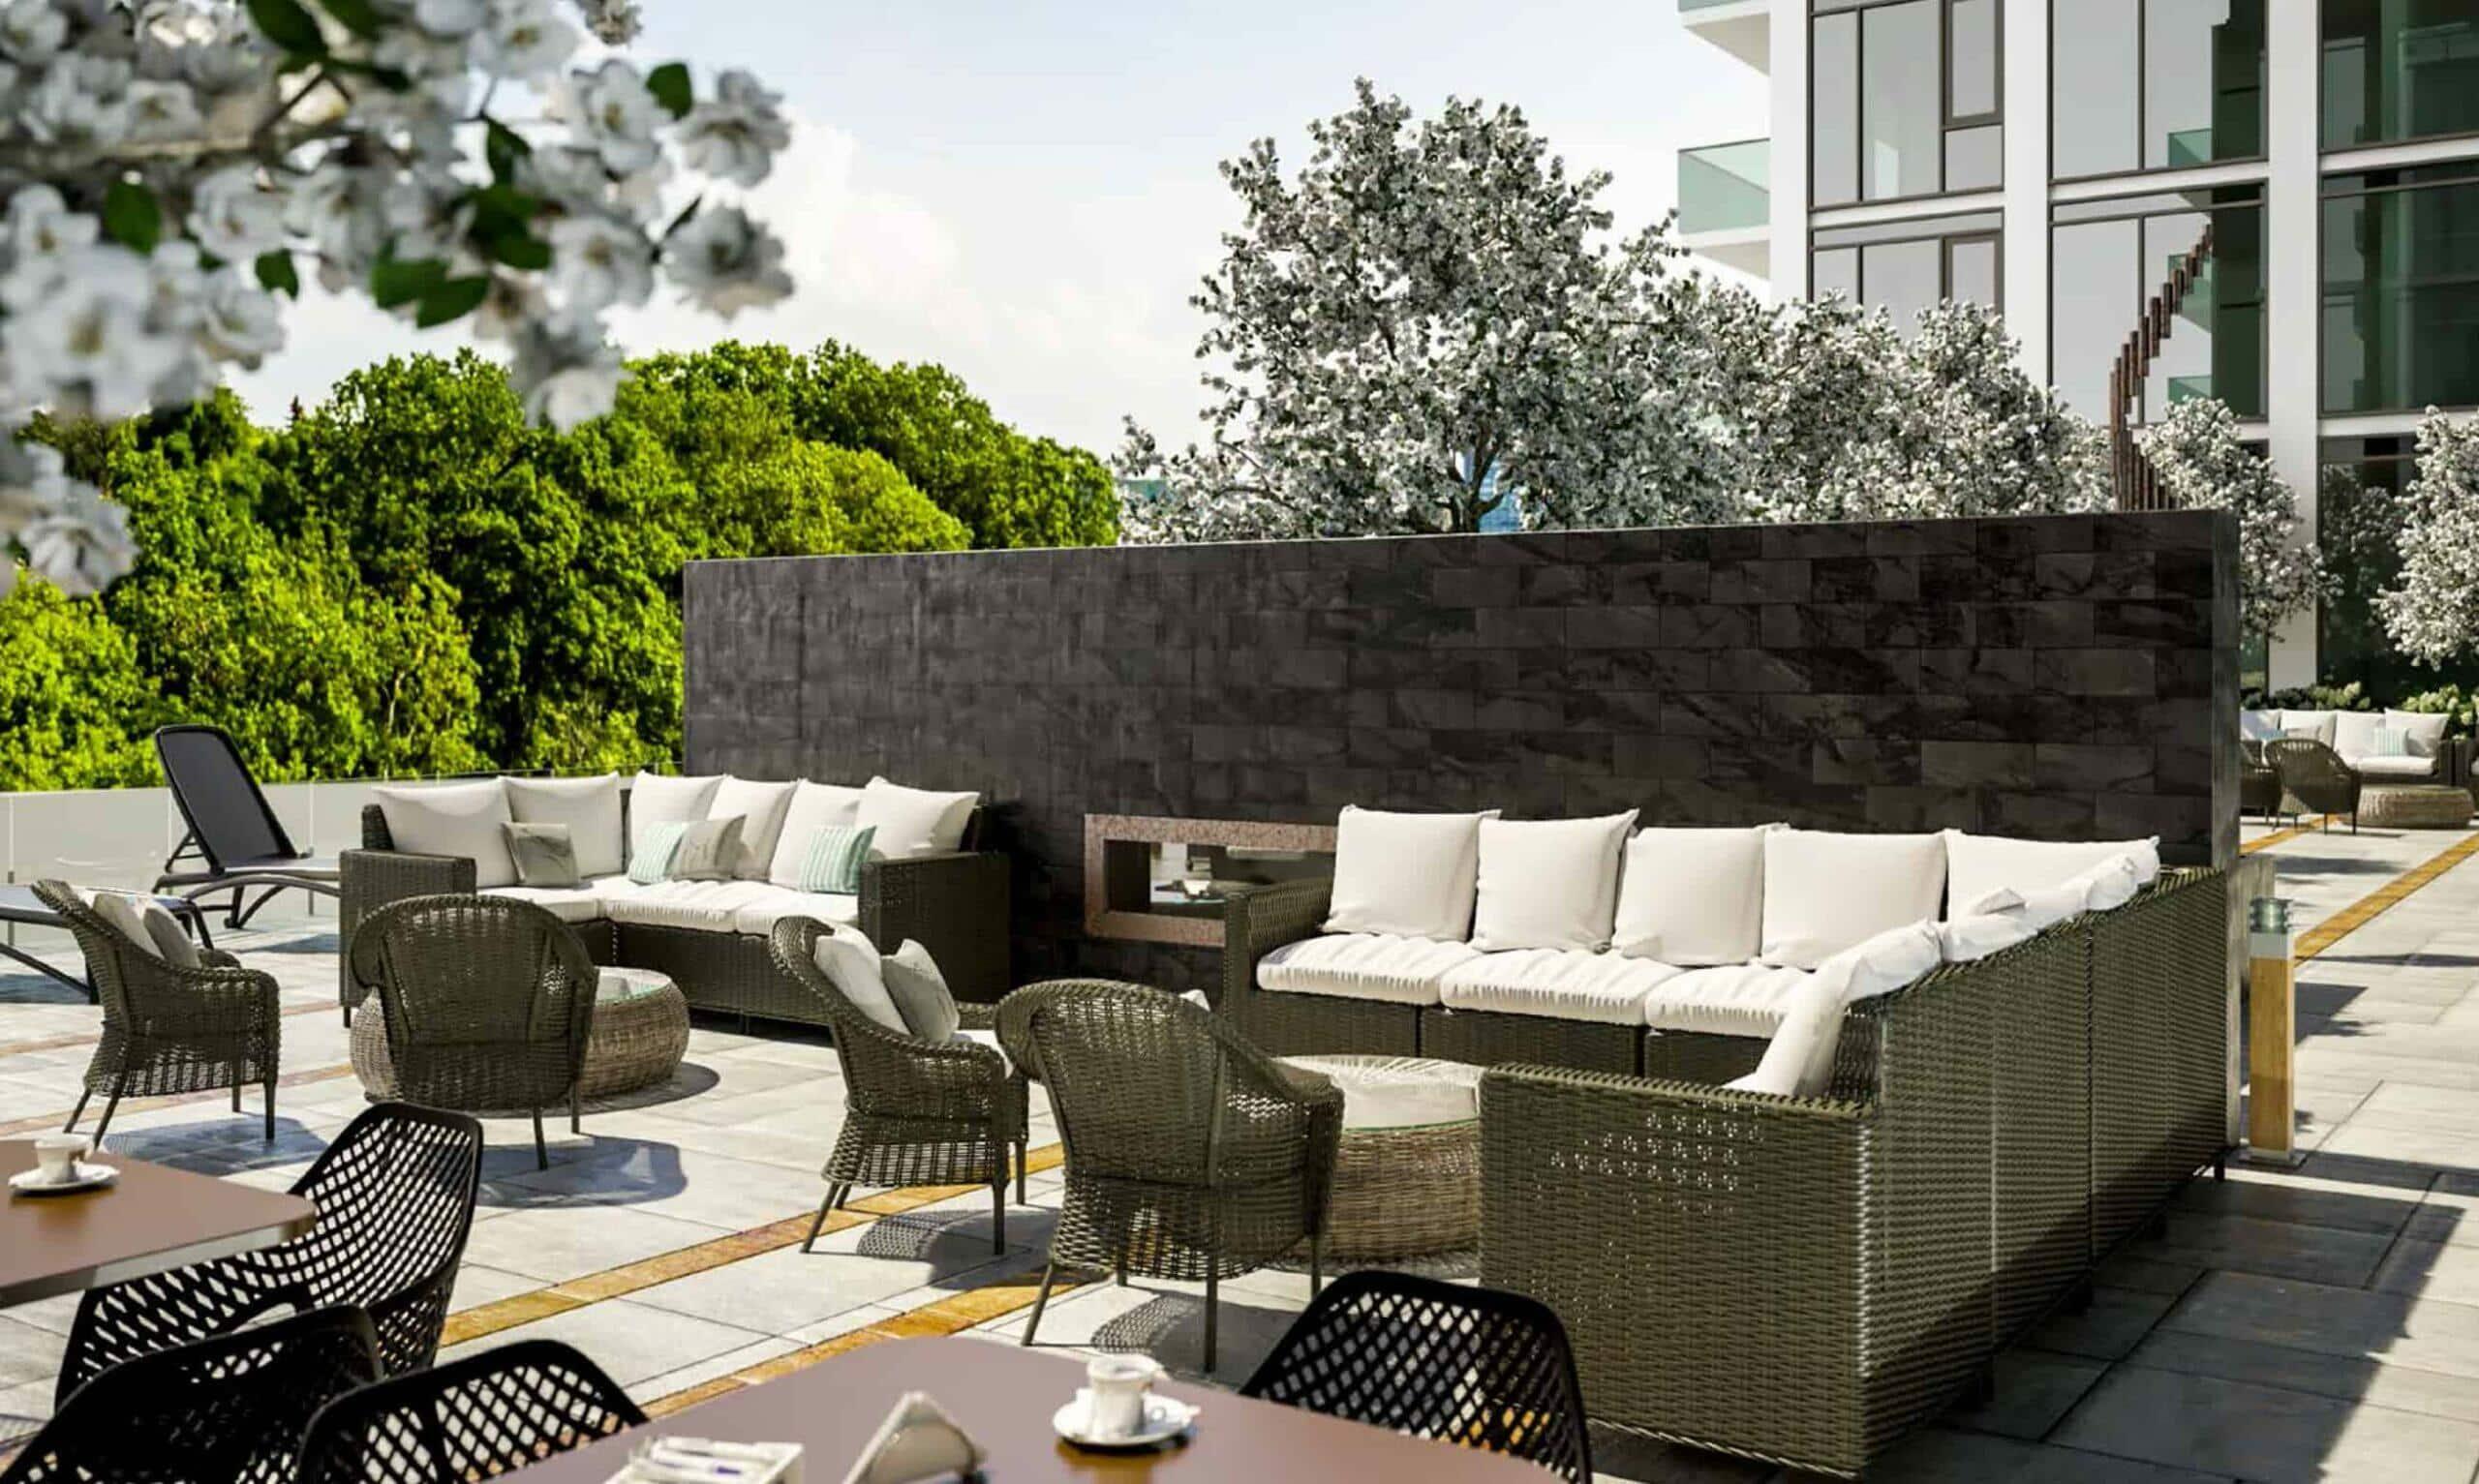 Bijou Terrace scaled